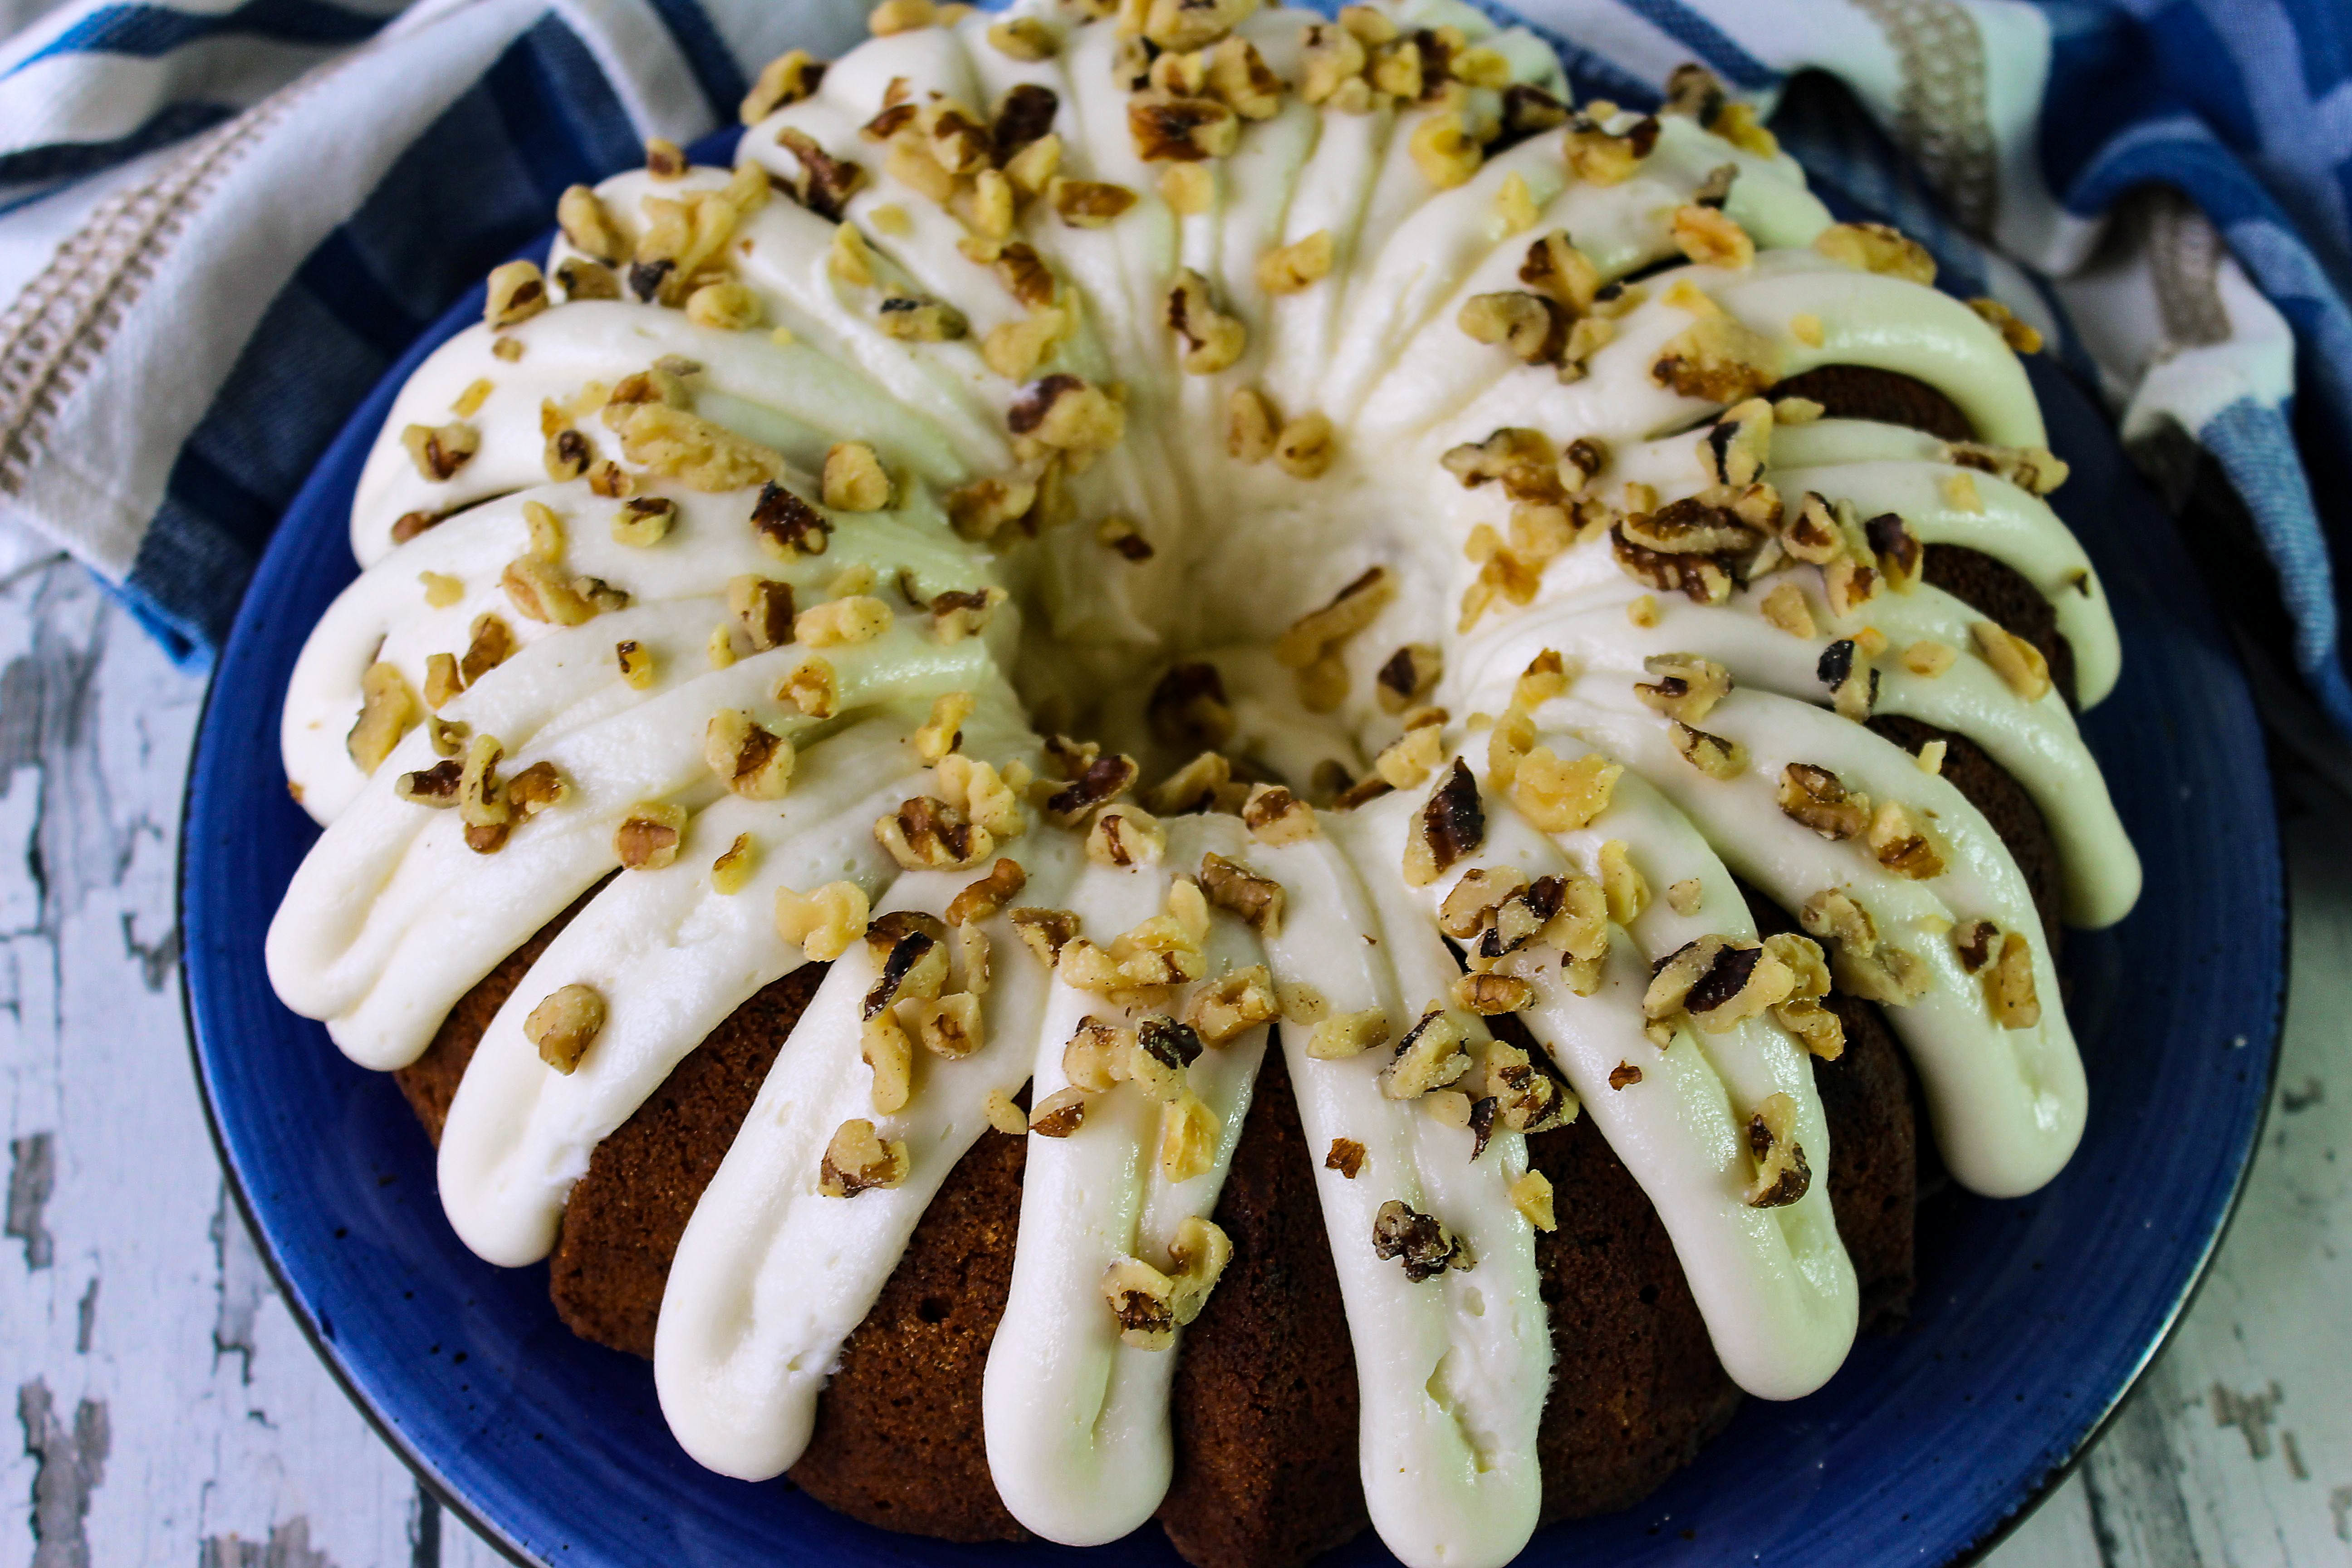 Peggy's Homemade Carrot Cake w/ Cream Cheese Icing Recipe